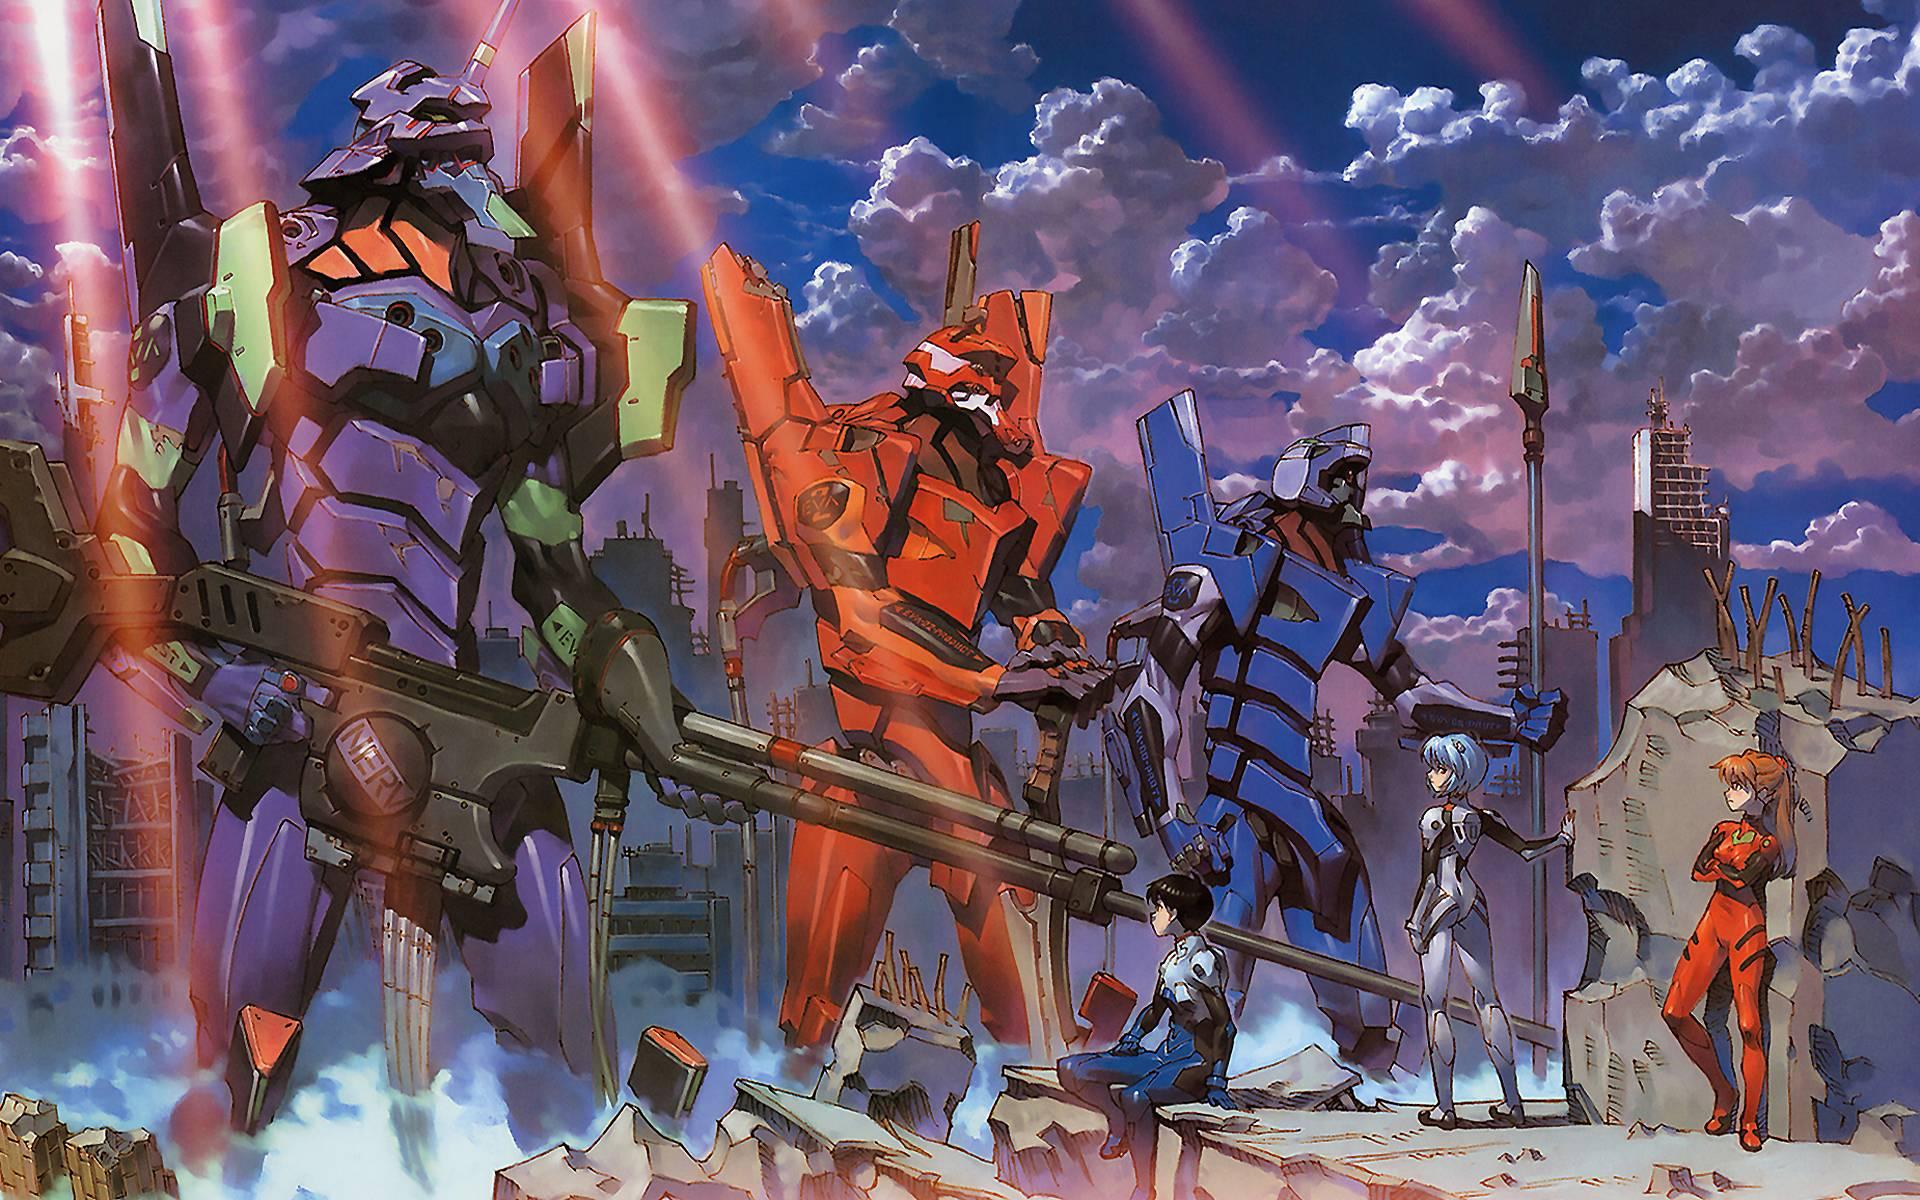 Neon Genesis Evangelion Wallpapers, Pictures, Images